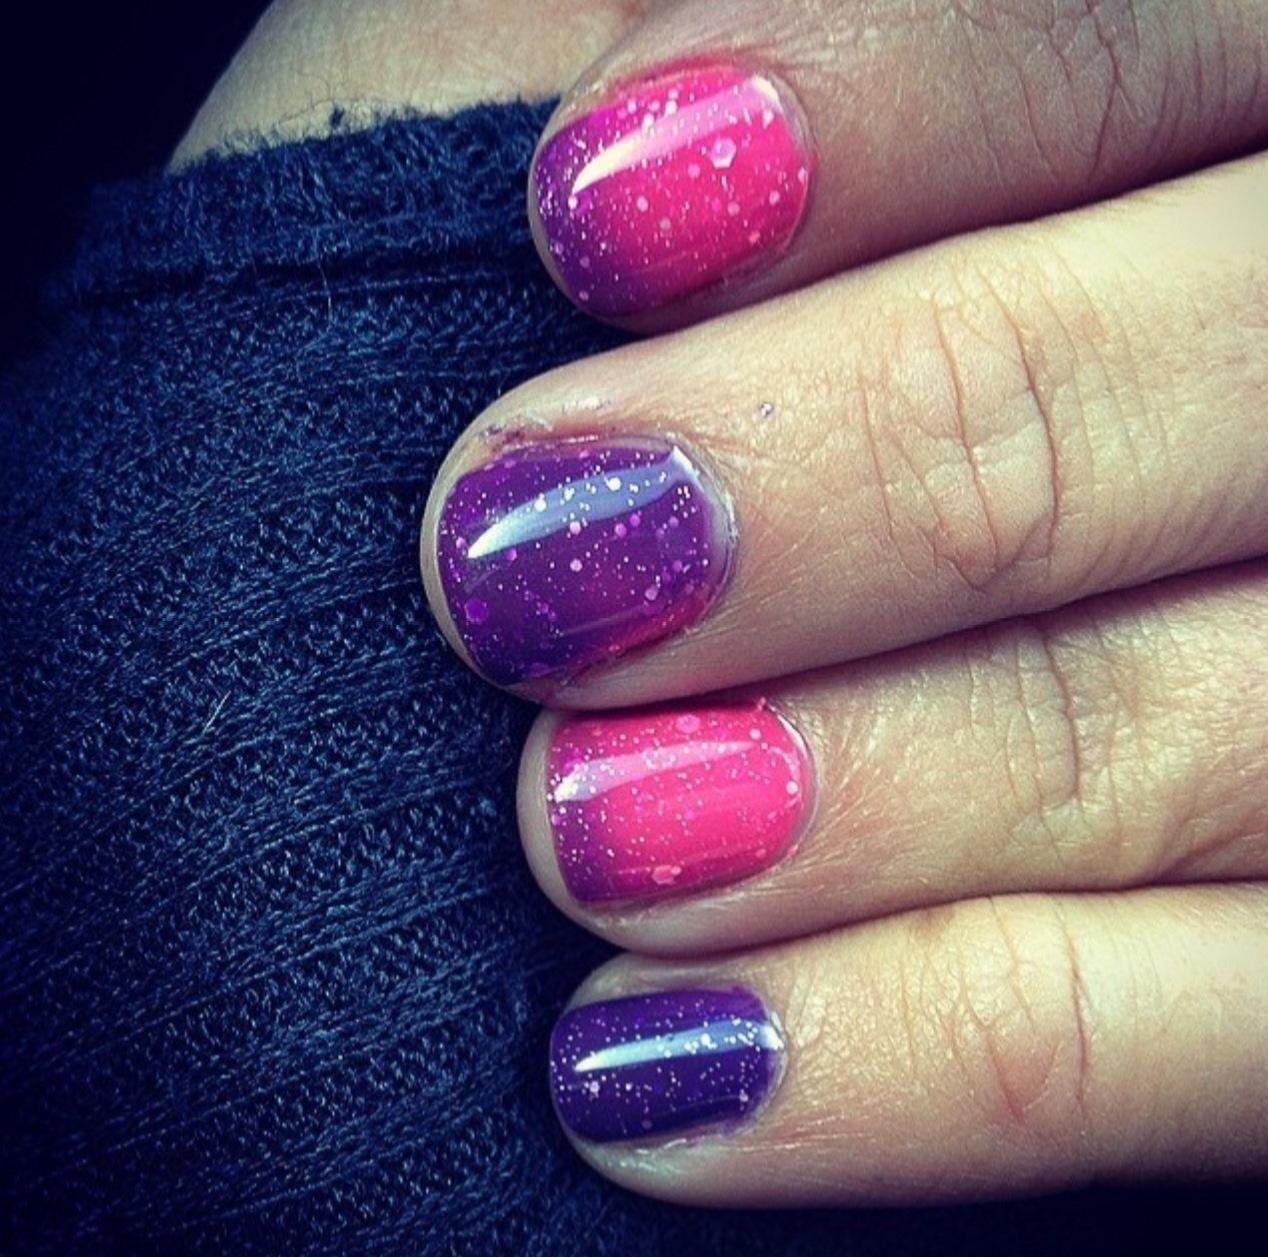 Winter nail art ideas best uv soak off gel shellac nail polish